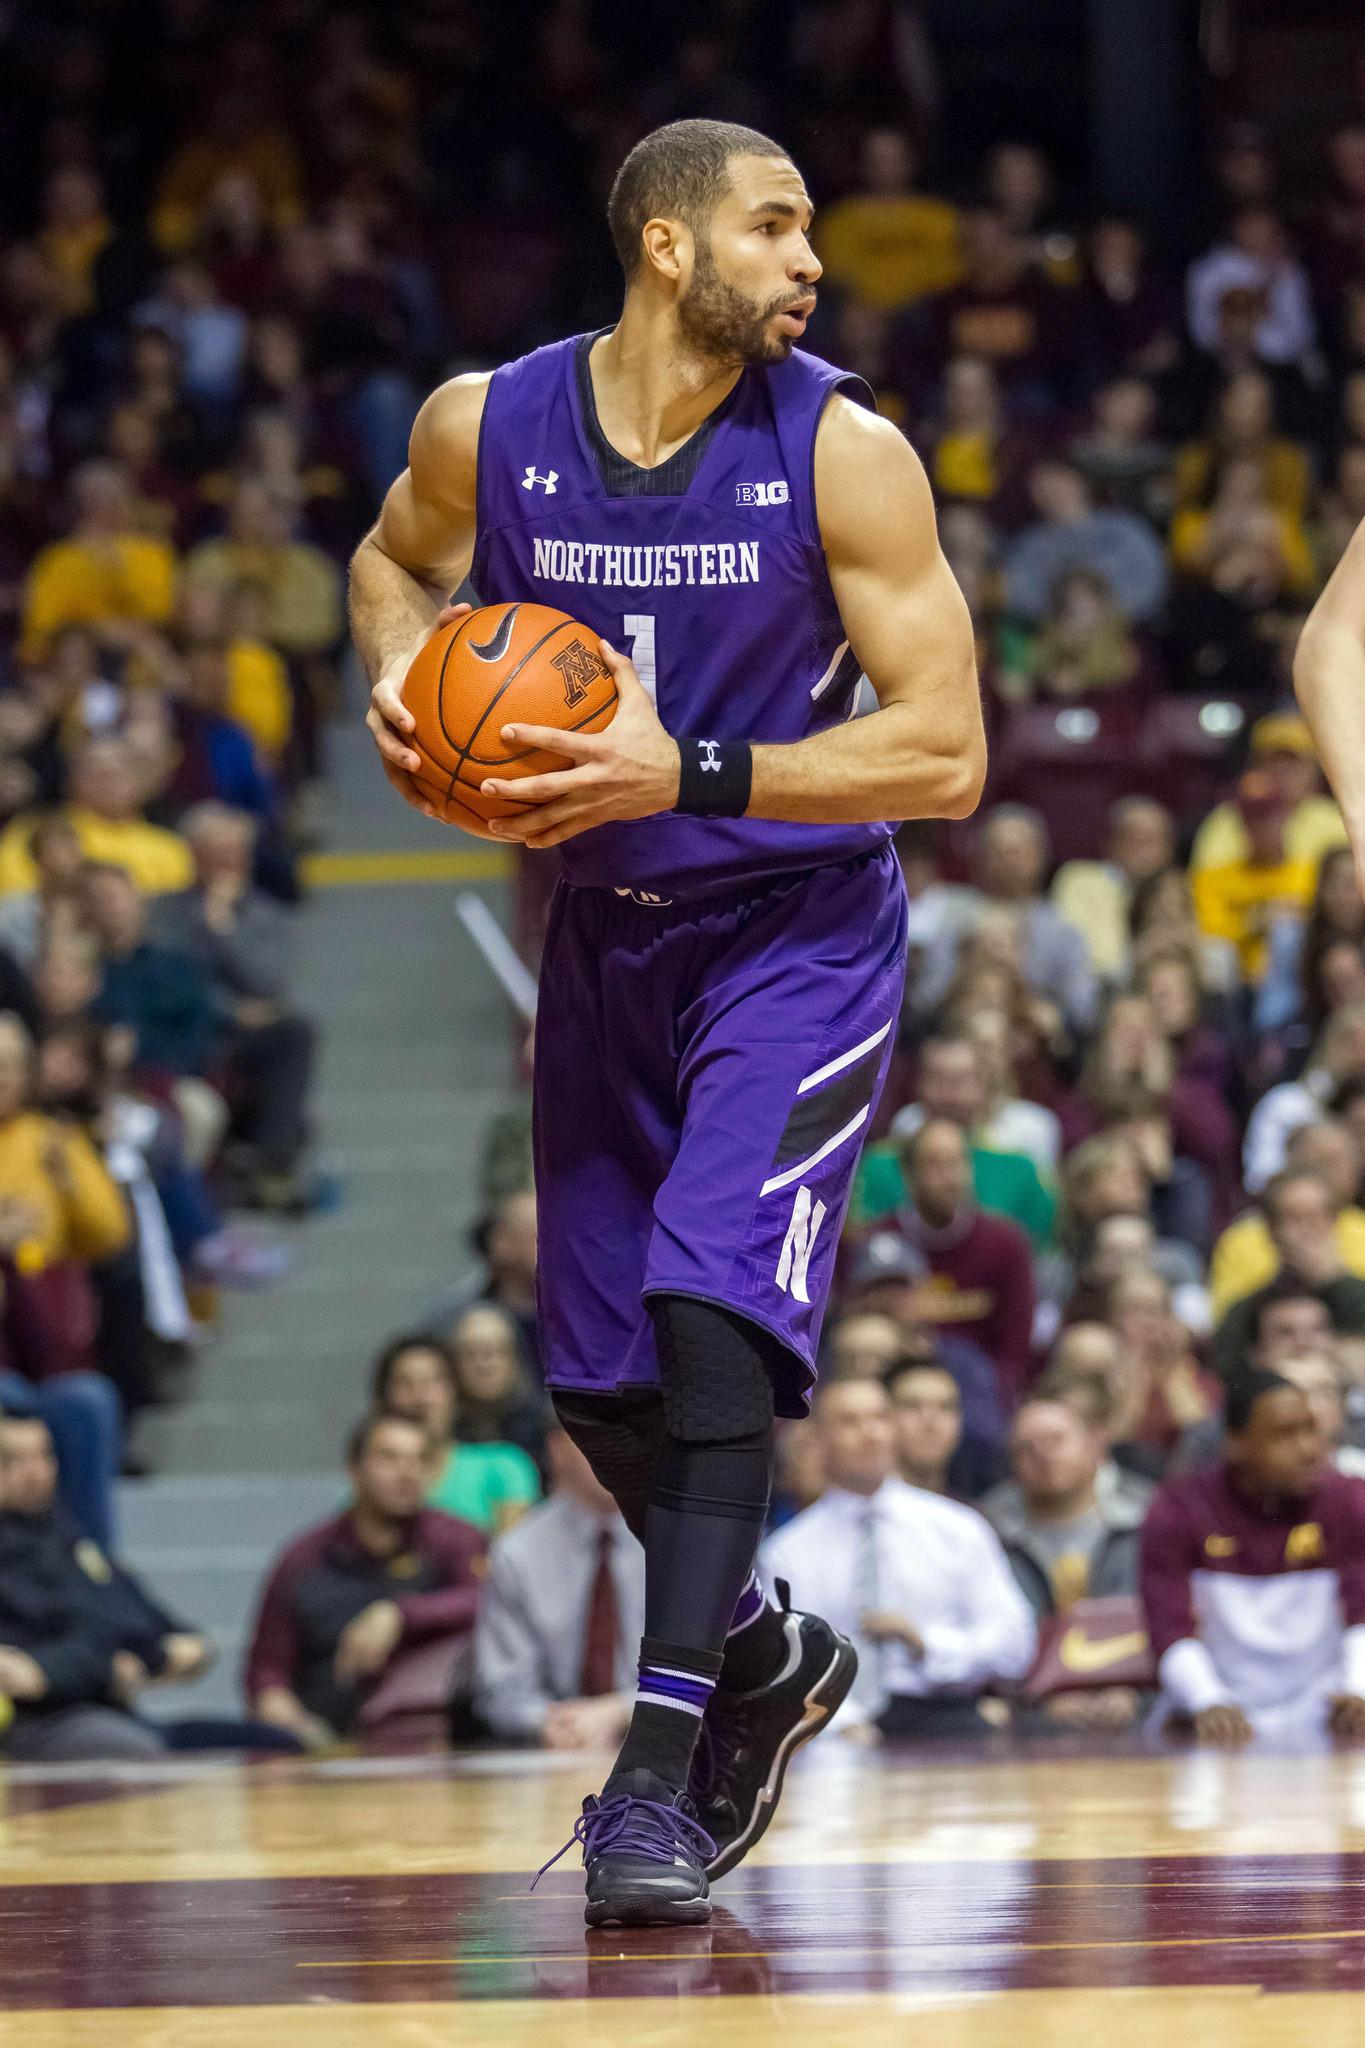 Northwestern's Drew Crawford rebounds in the second half against Minnesota.